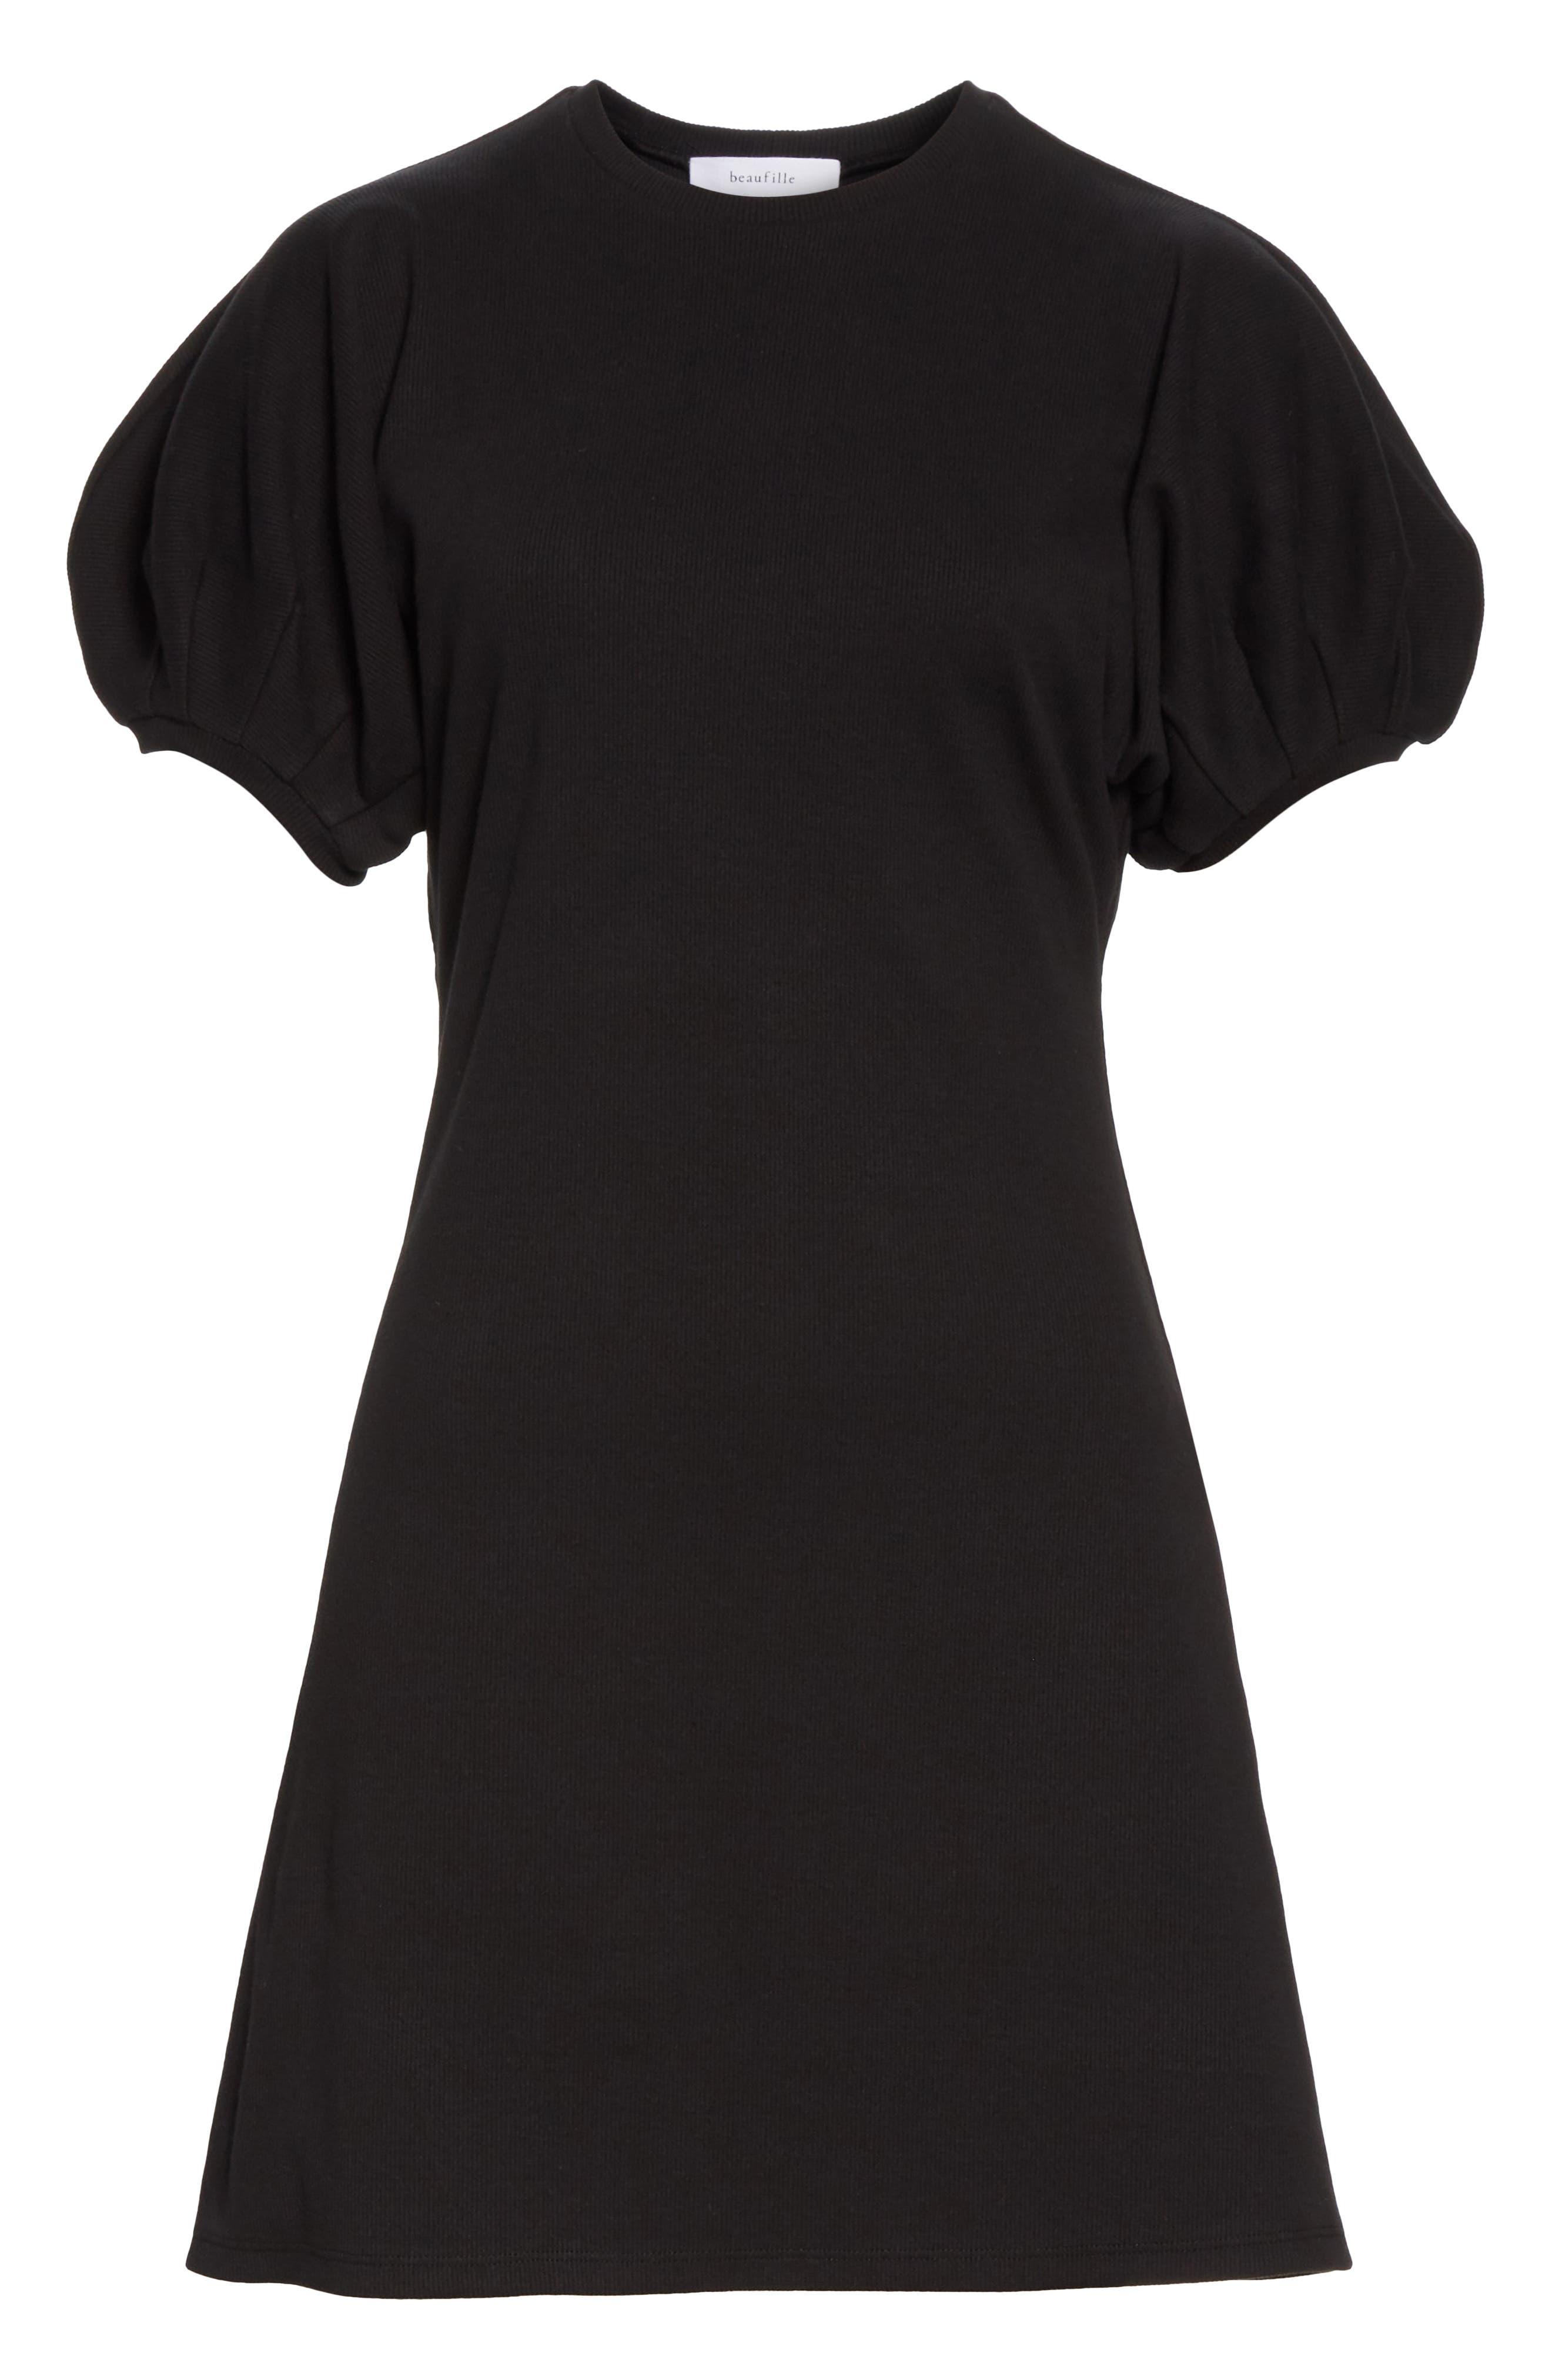 BEAUFILLE, Leda Puff Sleeve Dress, Alternate thumbnail 6, color, BLACK